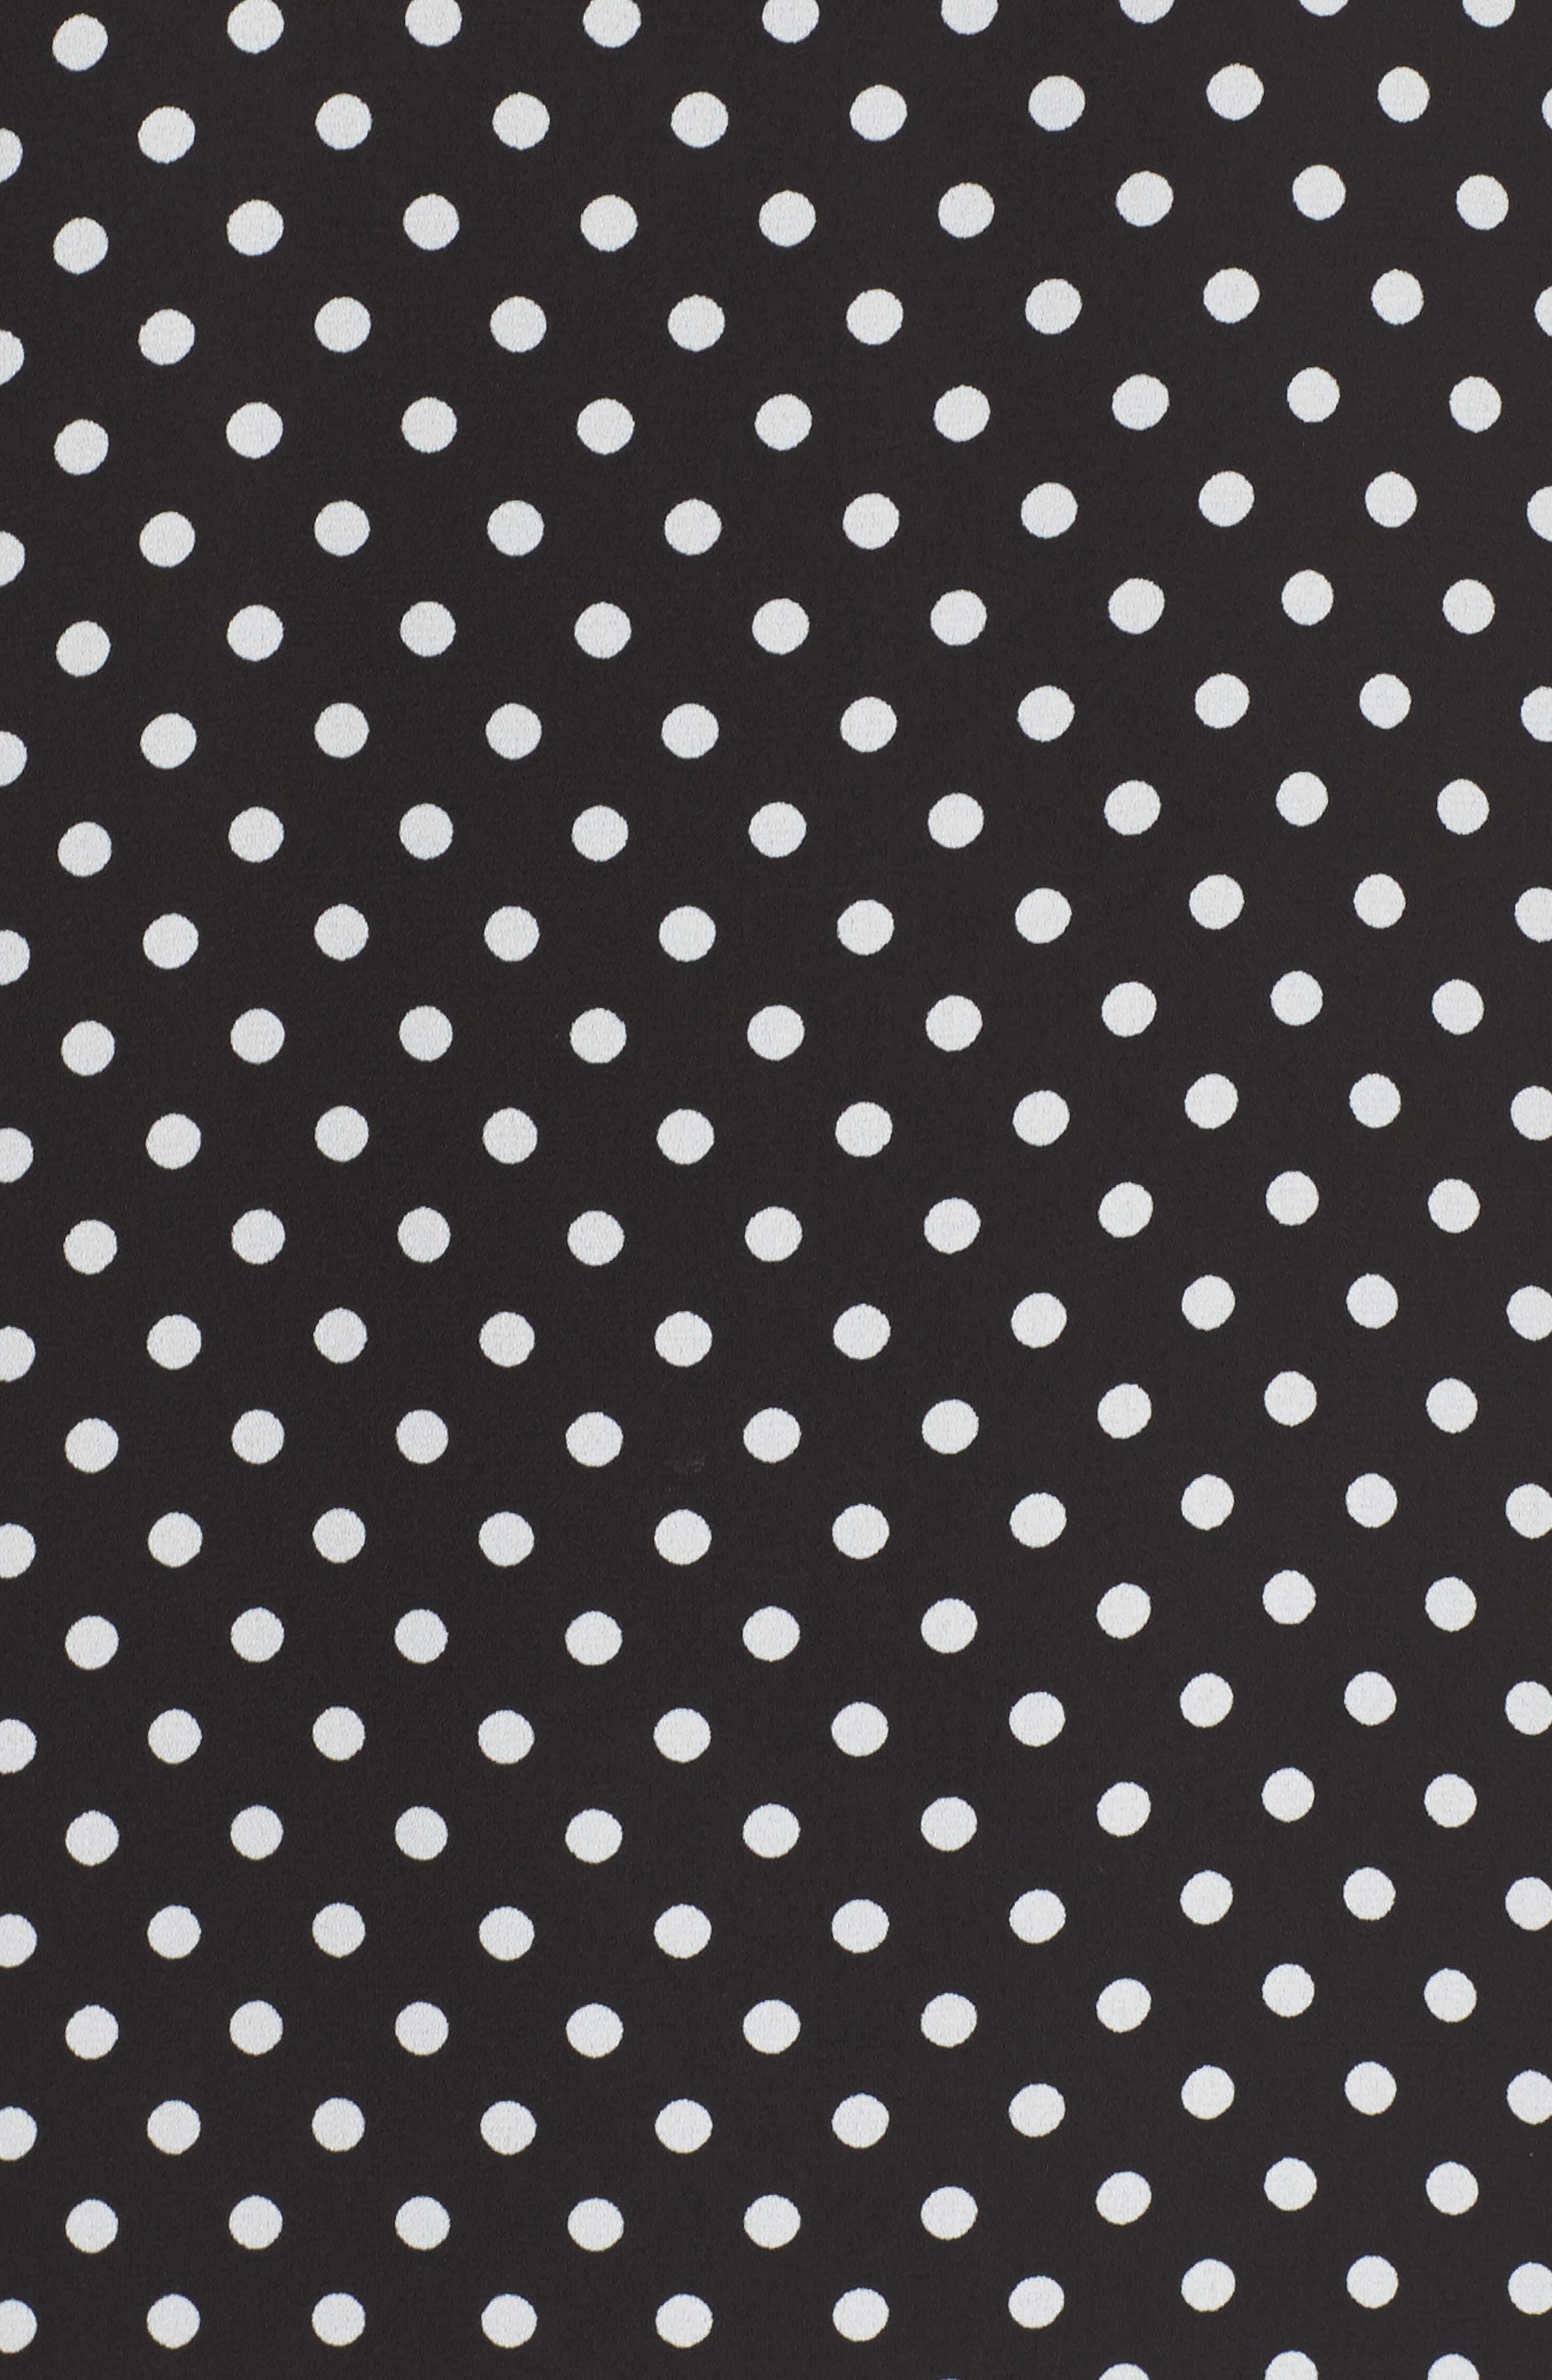 Polka Dot Off the Shoulder Minidress,                             Alternate thumbnail 5, color,                             001